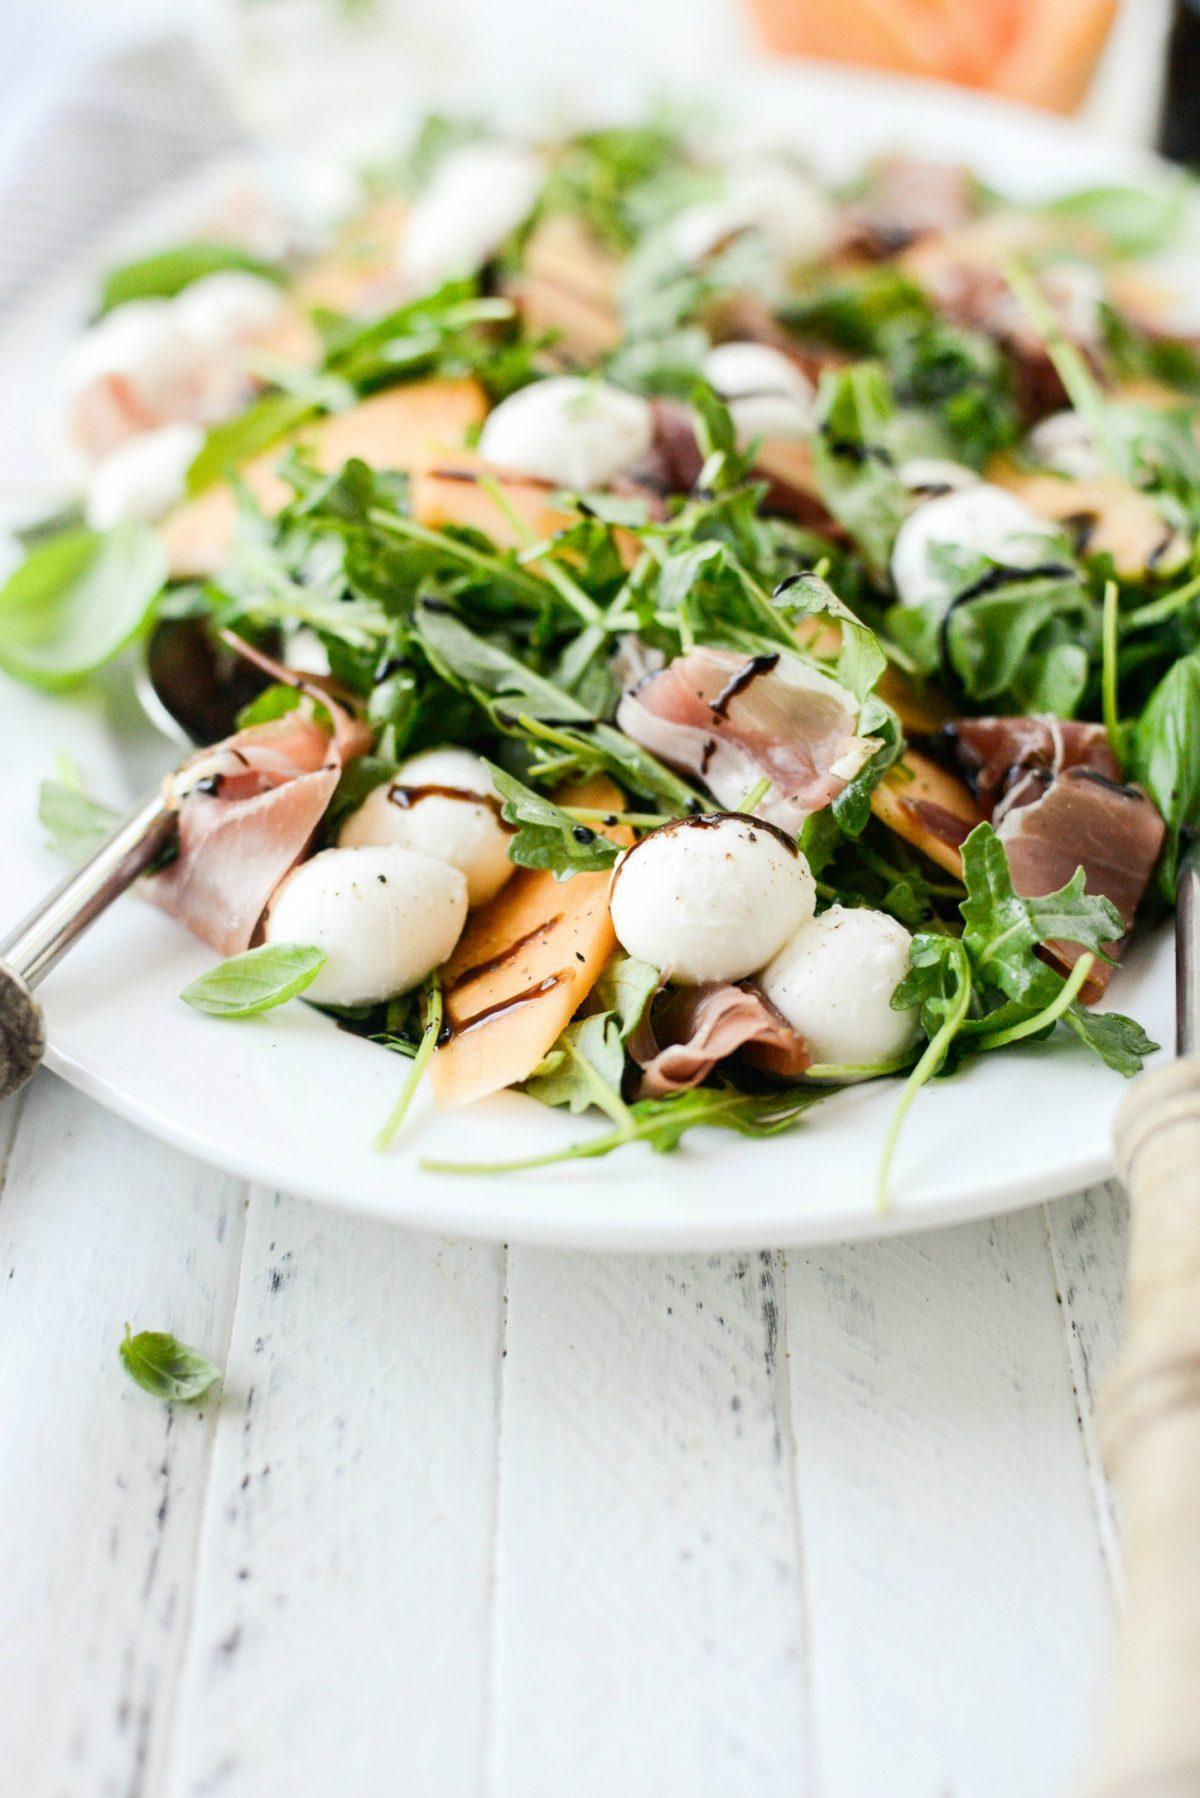 Cantaloupe and Prosciutto Arugula Salad l SimplyScratch.com